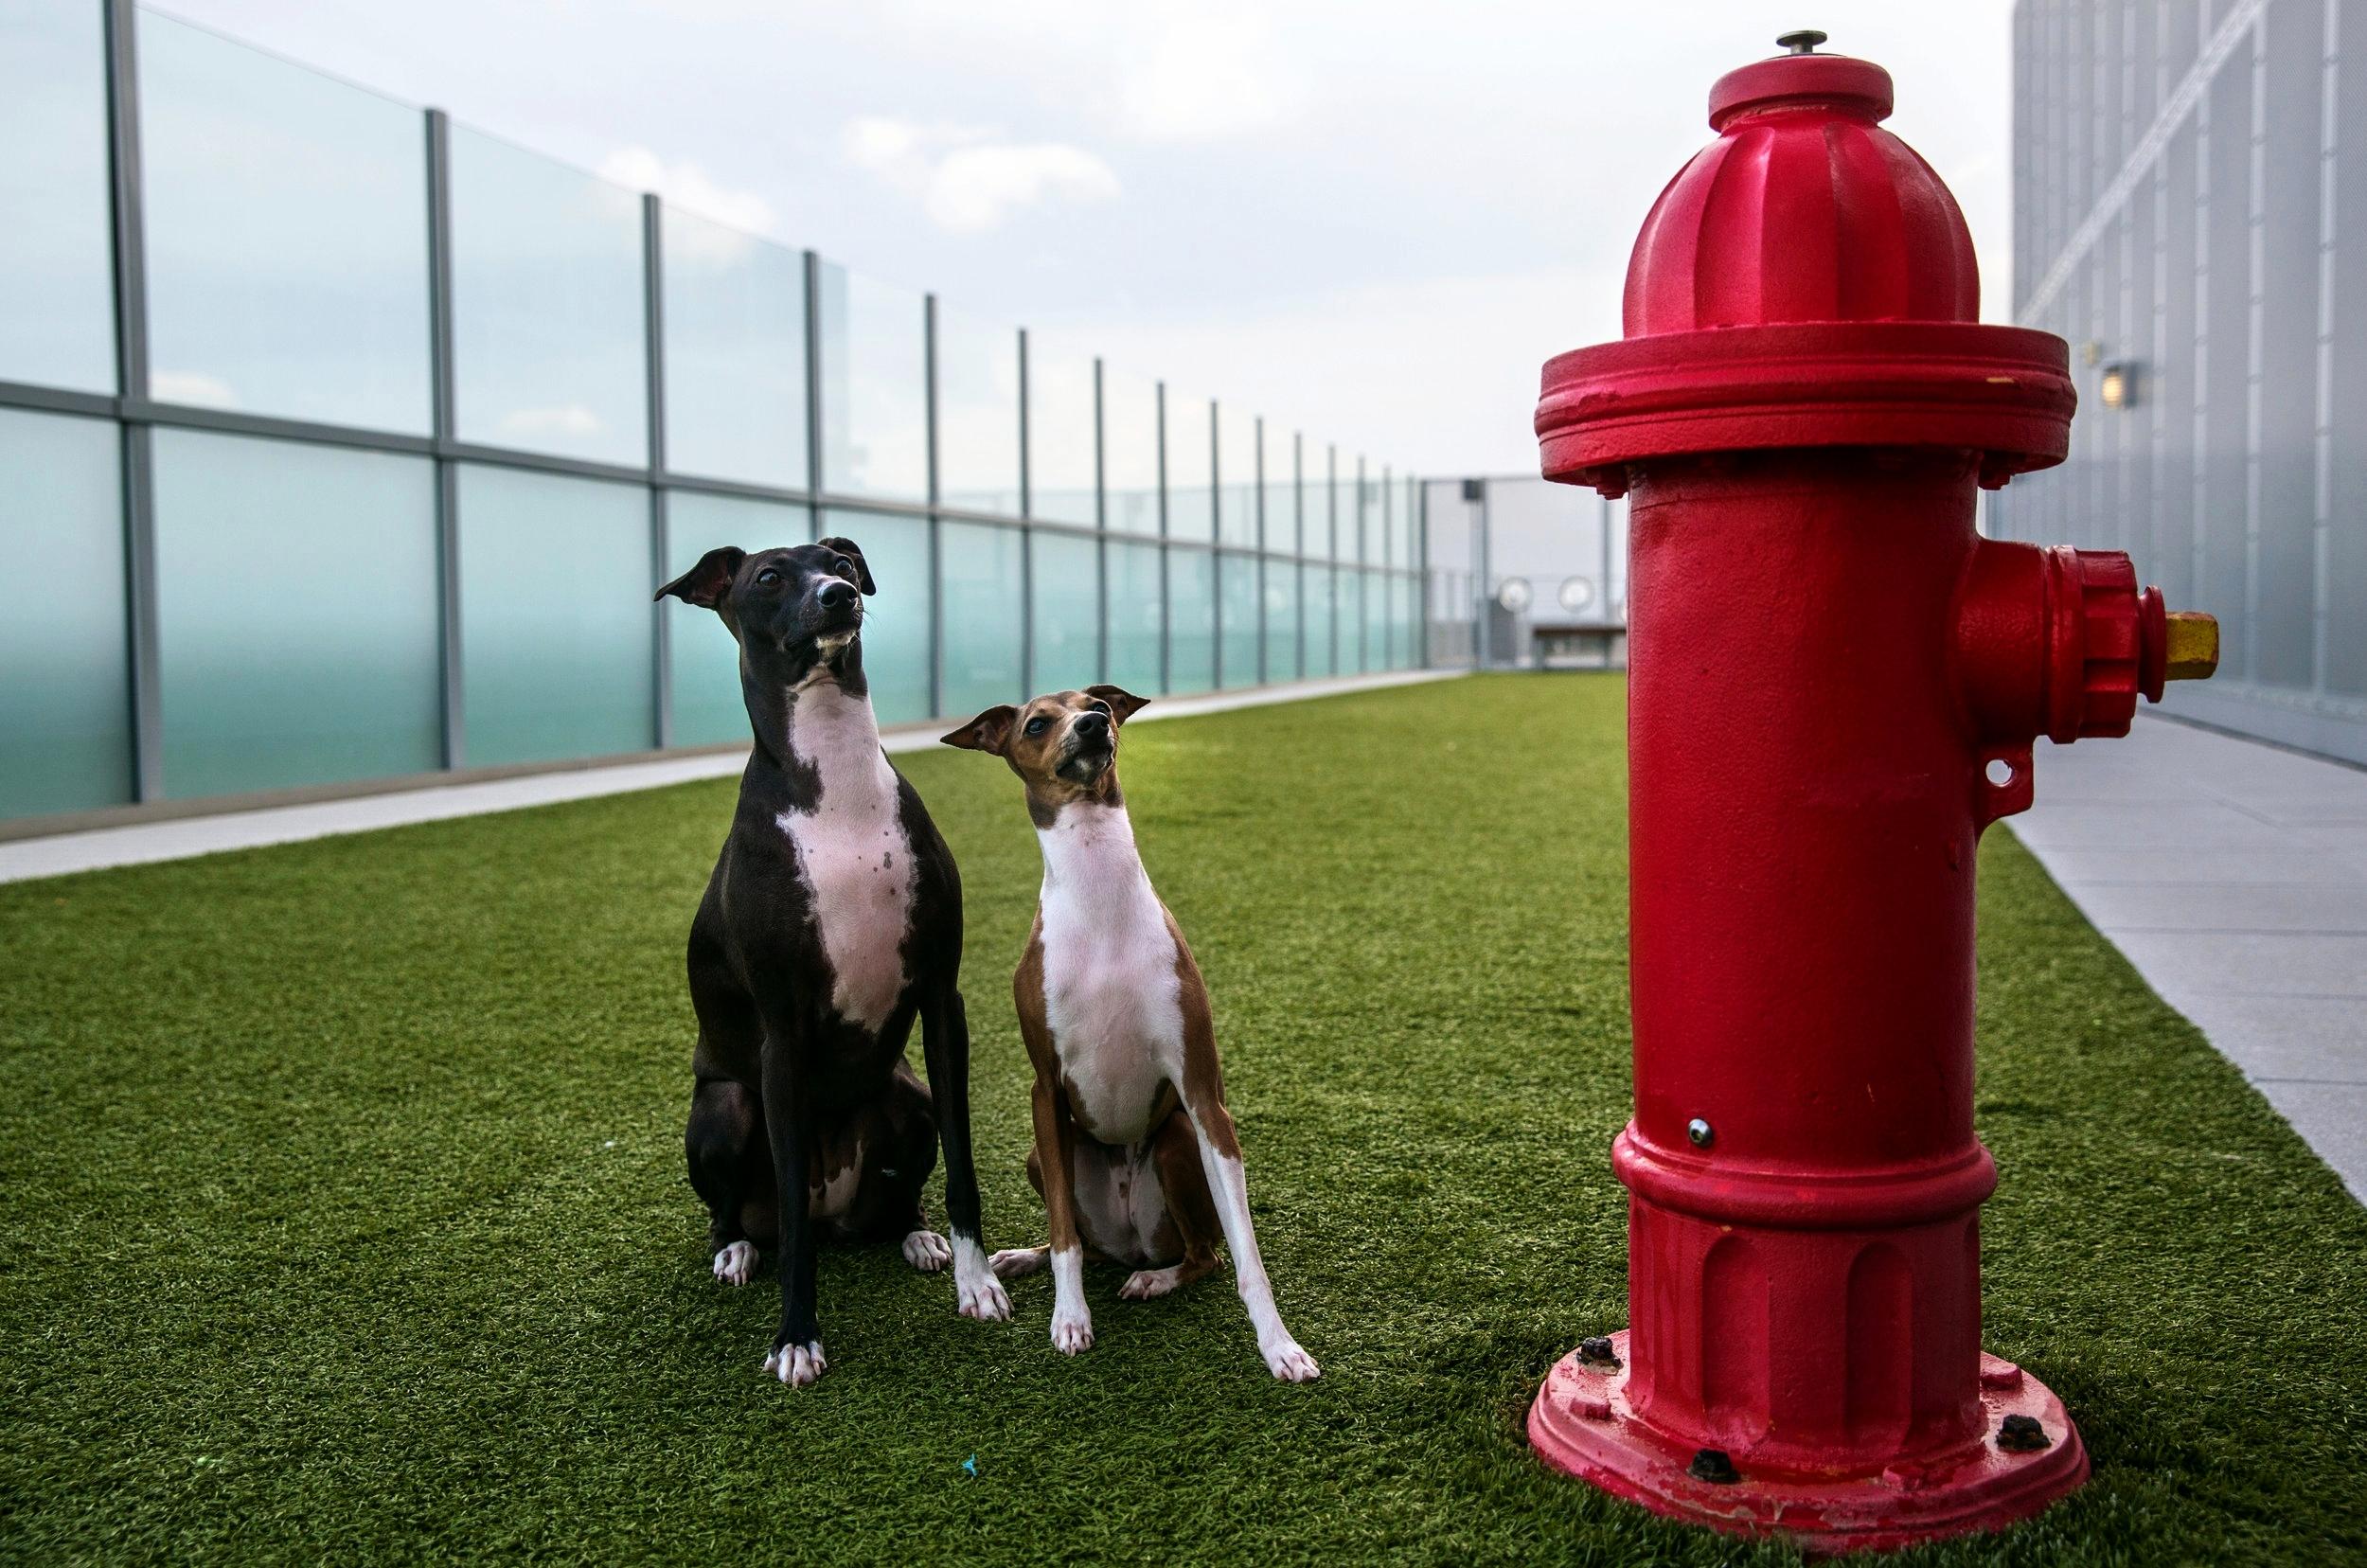 Italian greyhound sisters Gemma and Giada, enjoy the rooftop dog park at City Market at O Street in Washington, DC.